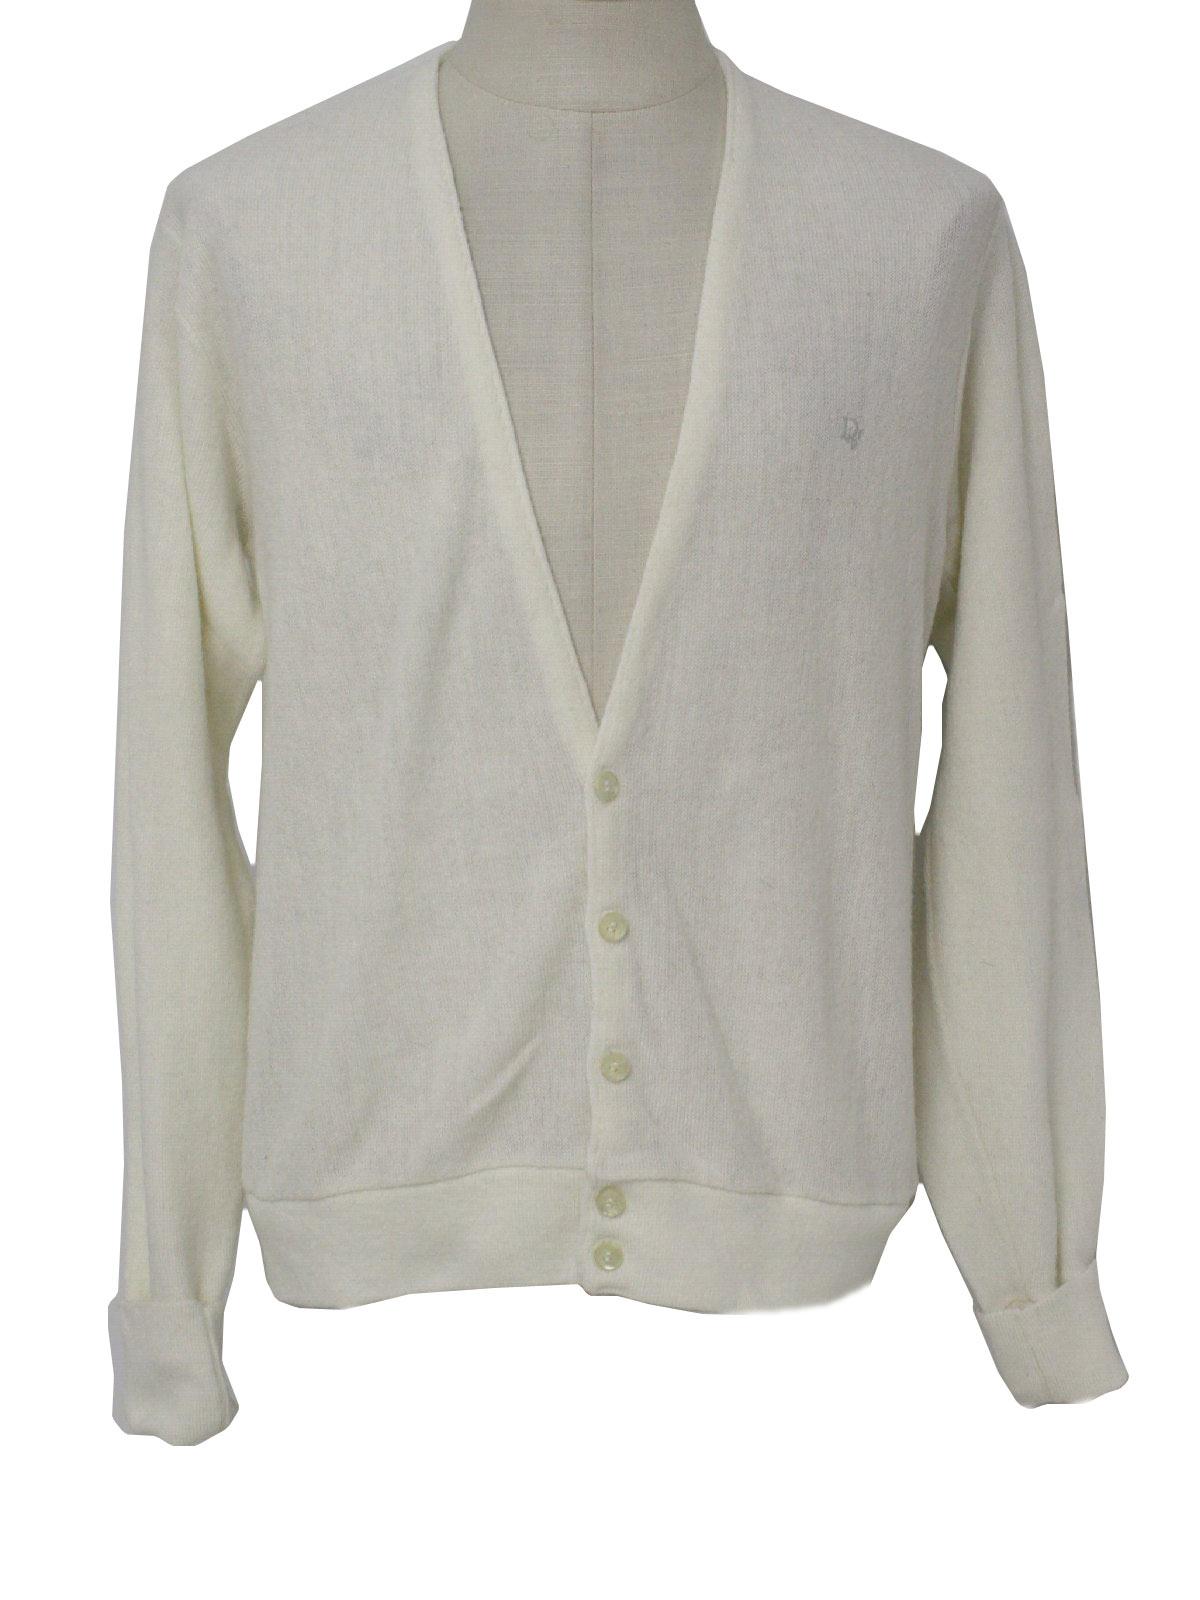 1980's Retro Caridgan Sweater: 80s -Christian Dior- Mens off white ...